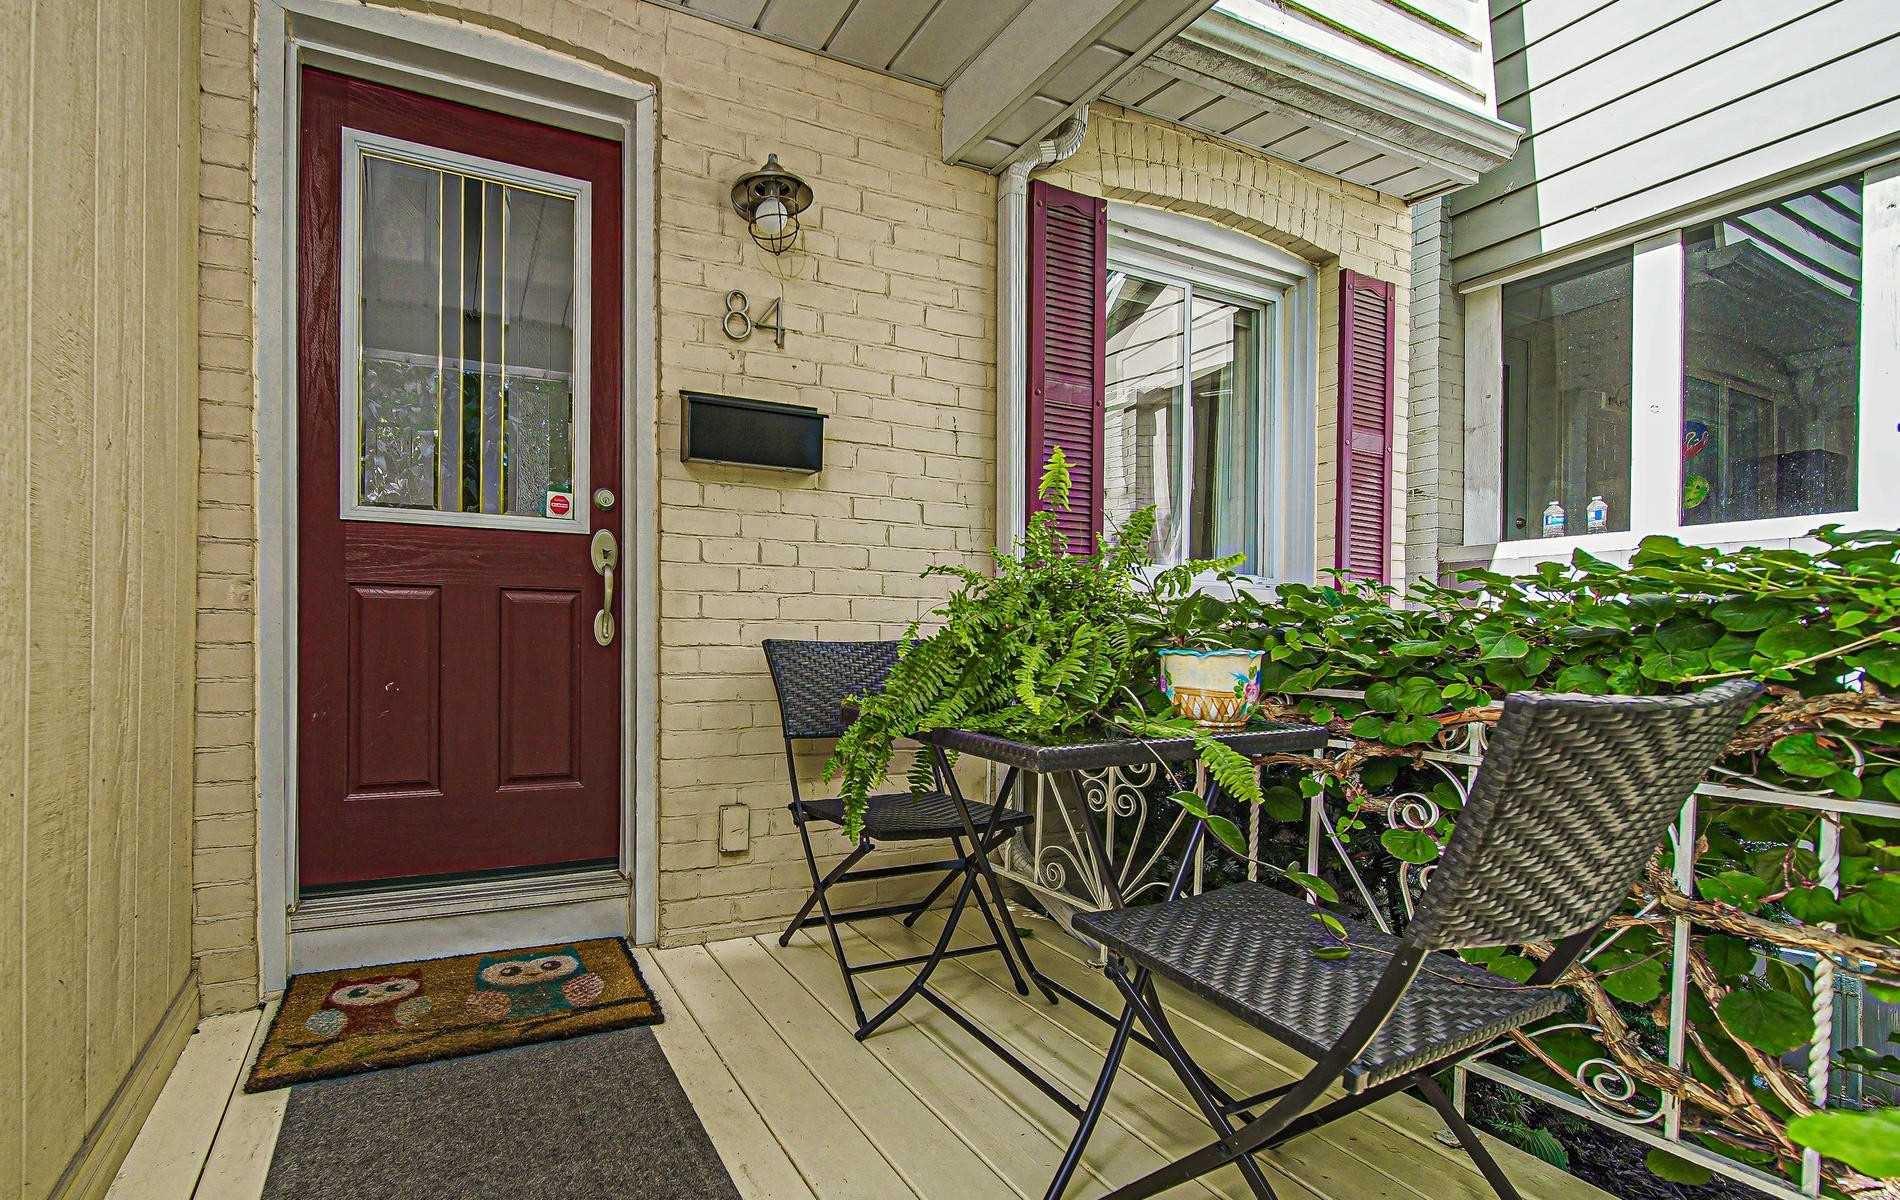 Photo 18: Photos: 84 Rushbrooke Avenue in Toronto: South Riverdale House (2-Storey) for sale (Toronto E01)  : MLS®# E4600791